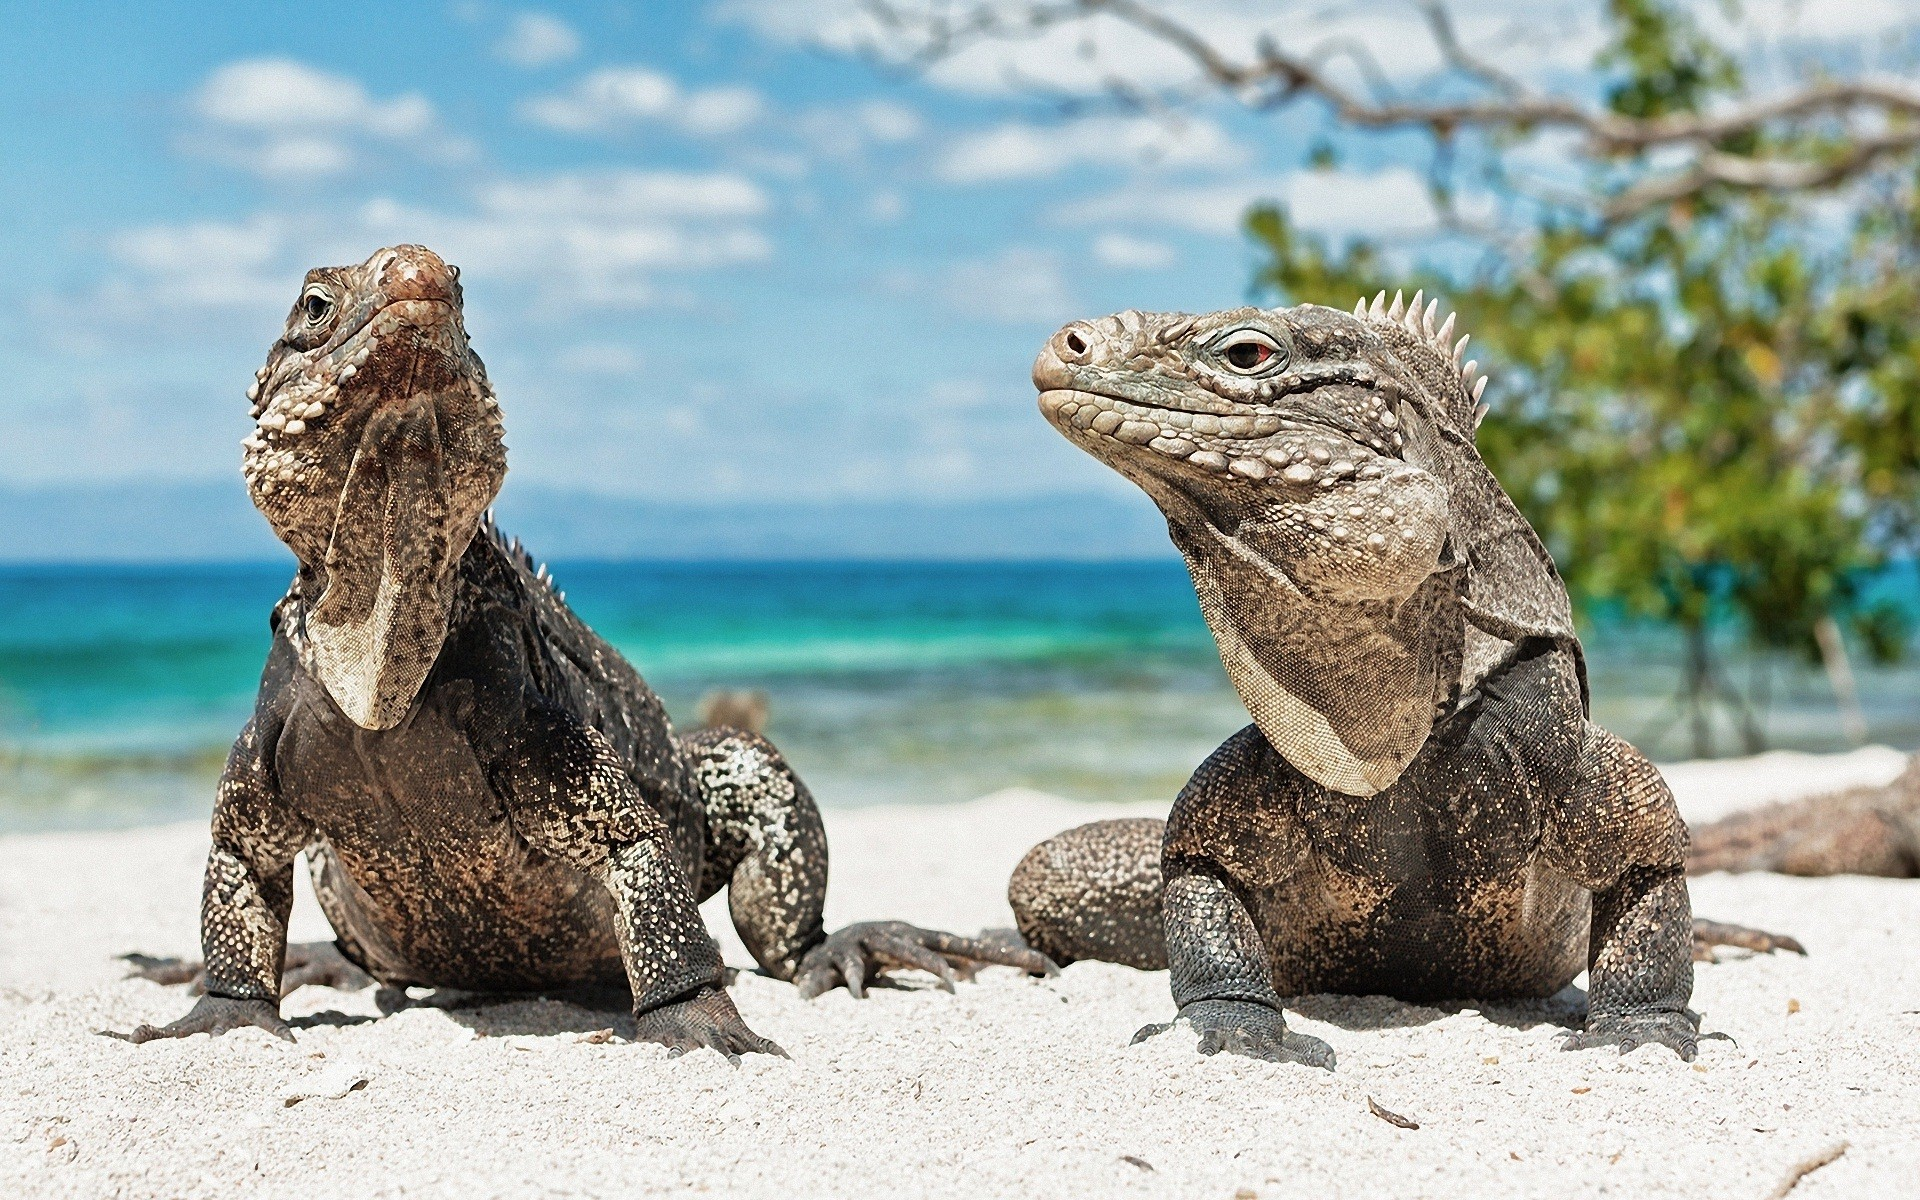 iguana on beach wallpaper background wallpapers